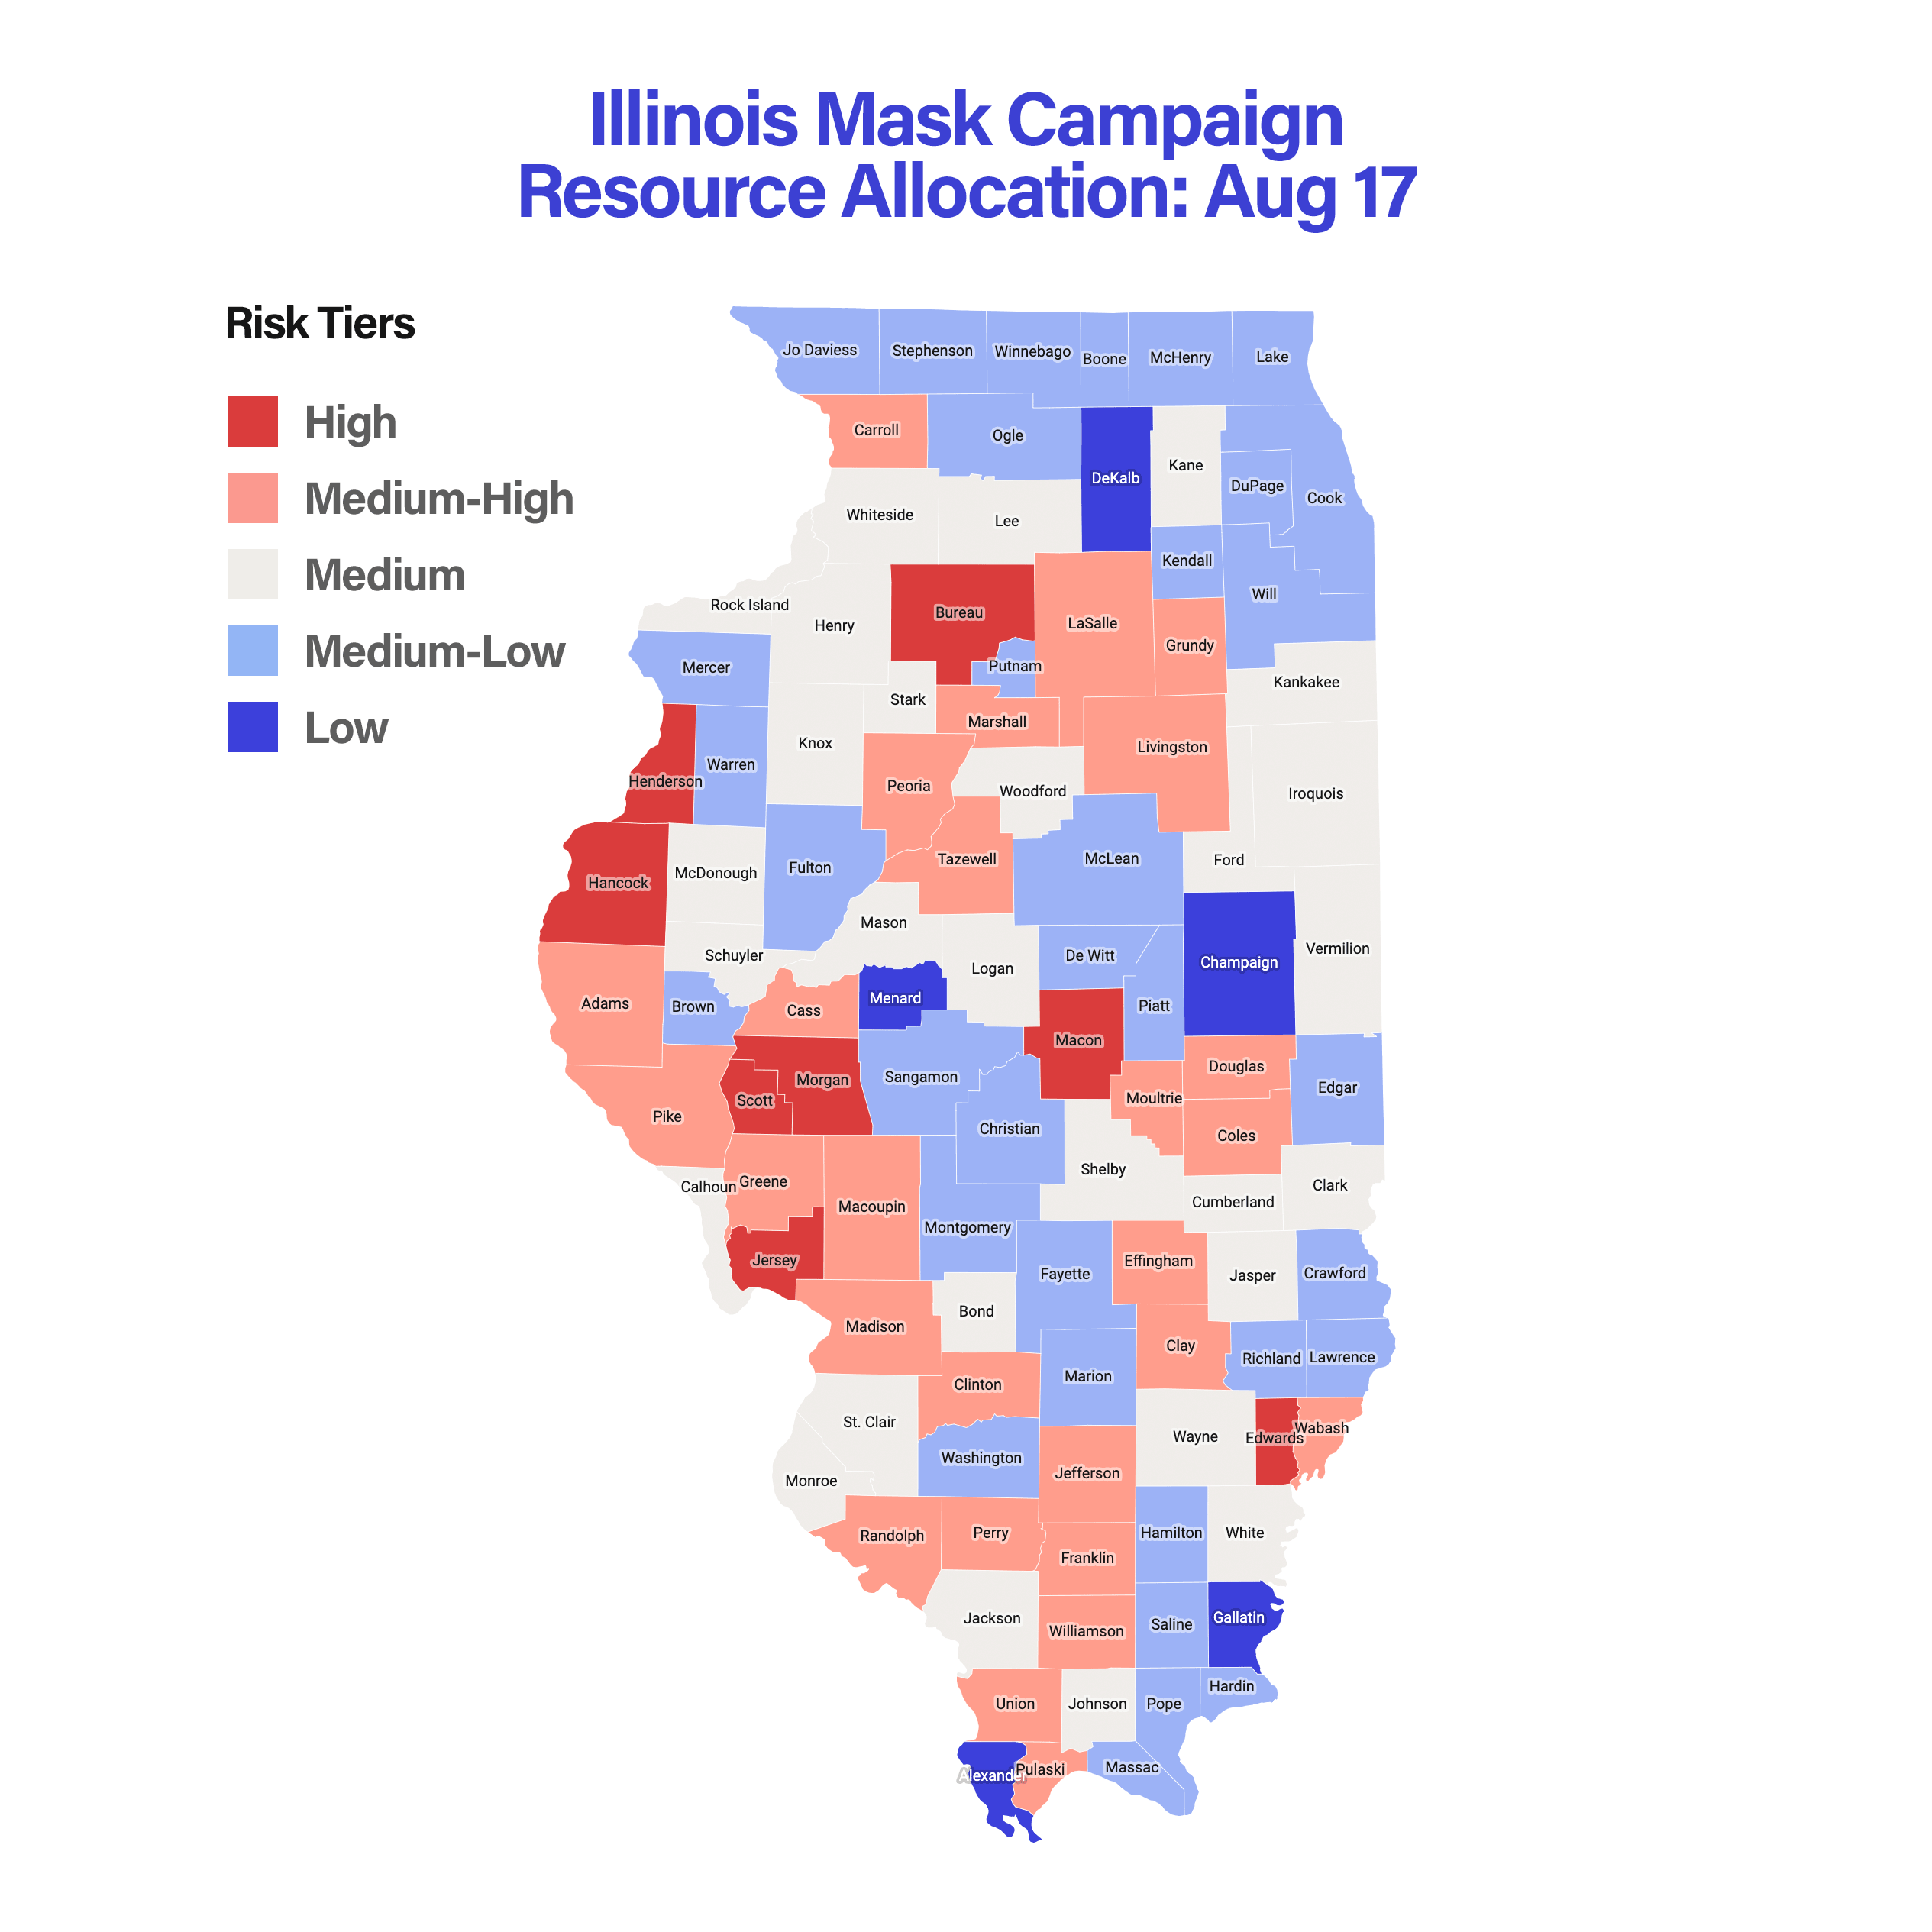 Illinois Mask Campaign Resource Allocation: Aug 17